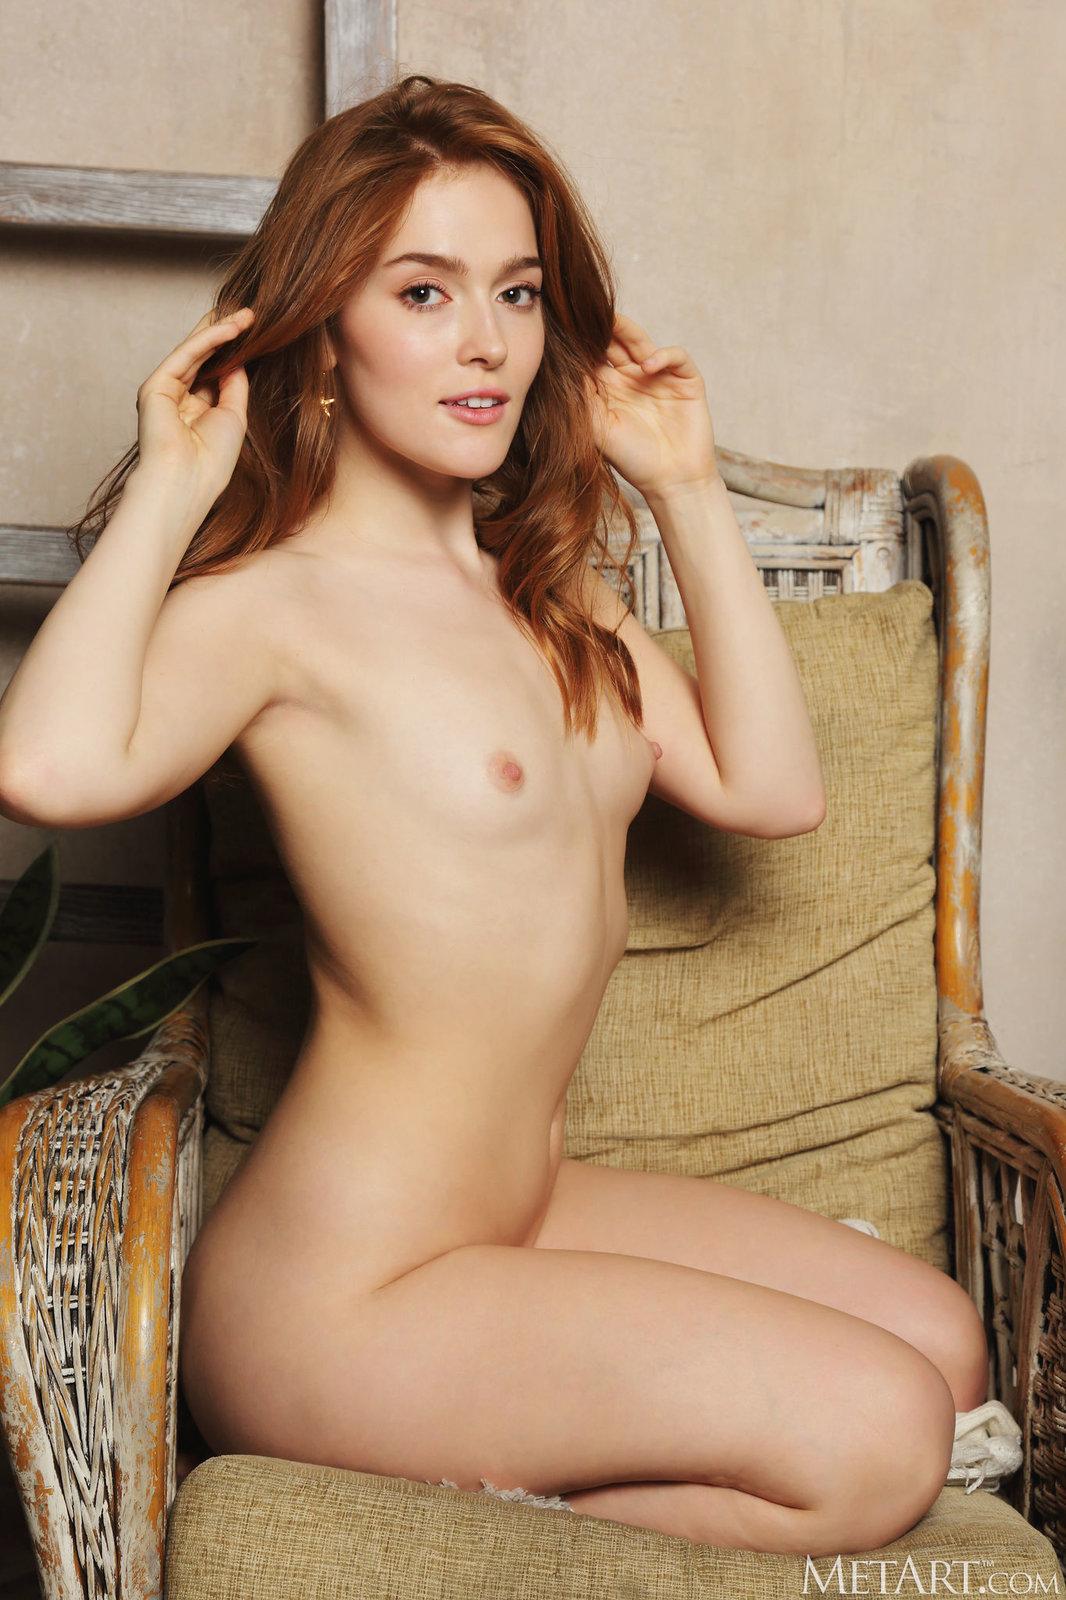 Zdjęcie porno - jia lissa dark velvet metart 13 - Ruda laska z małym biustem